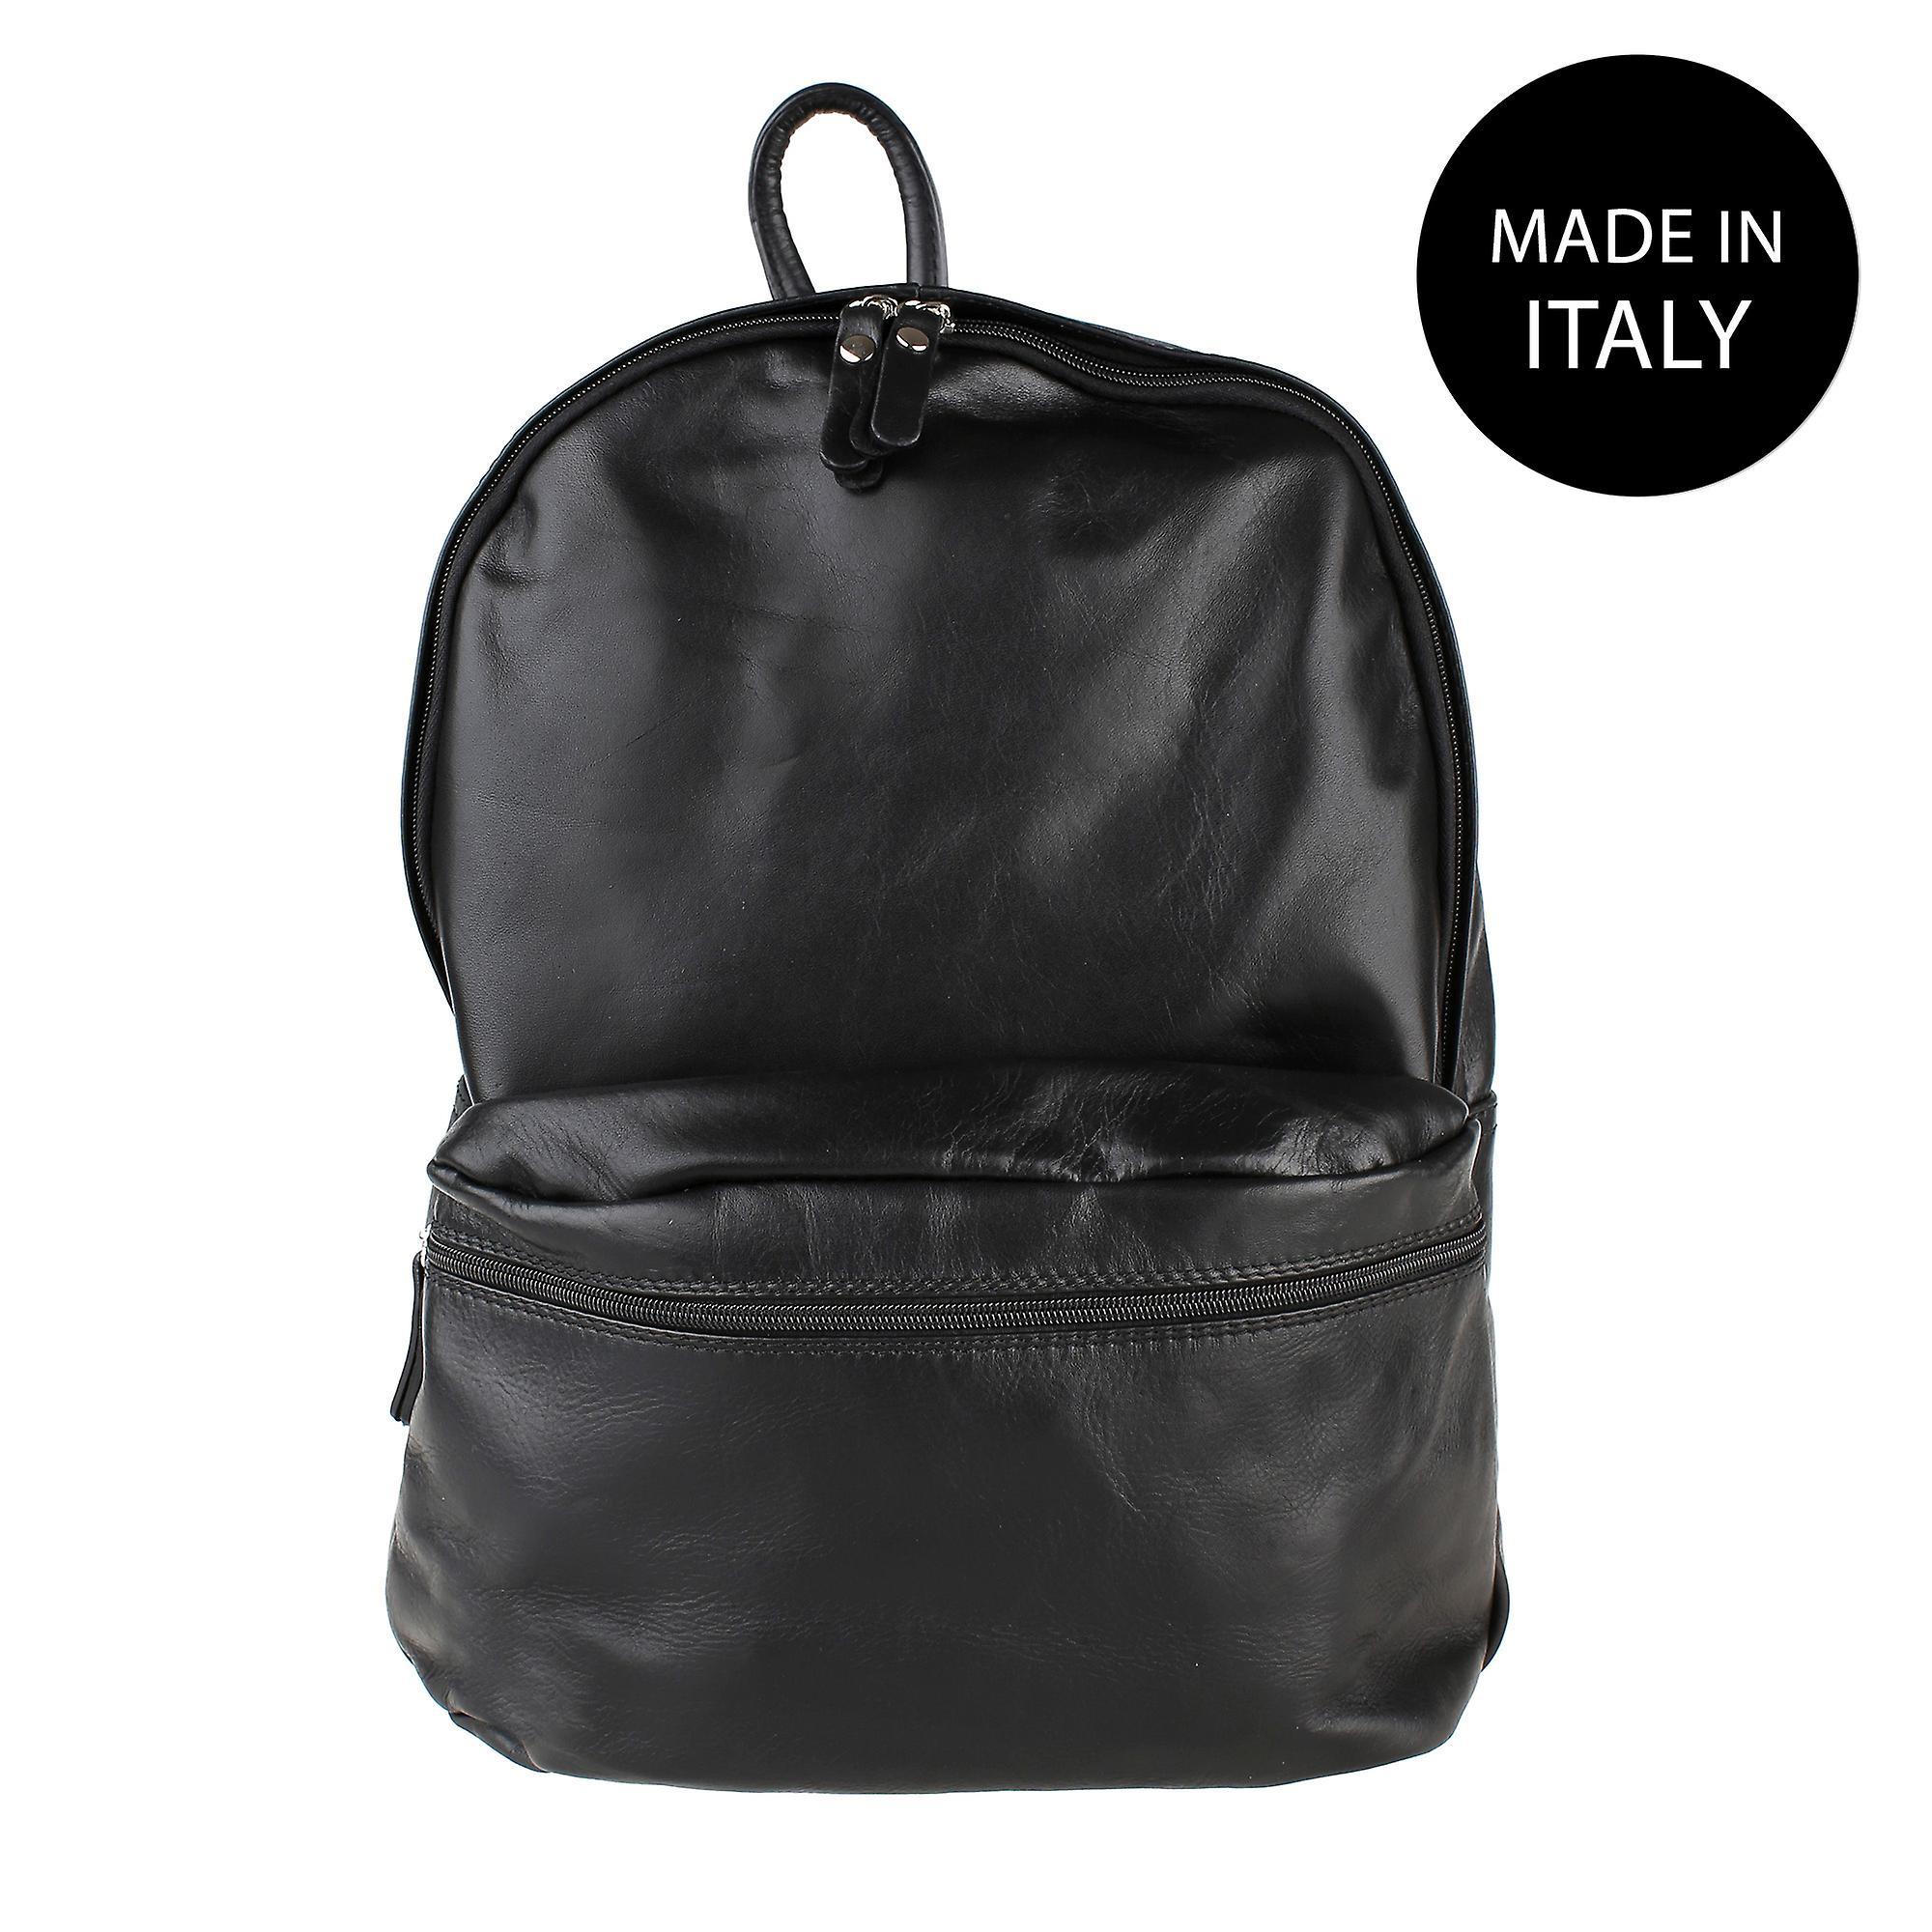 Læder rygsæk i italiensk læder